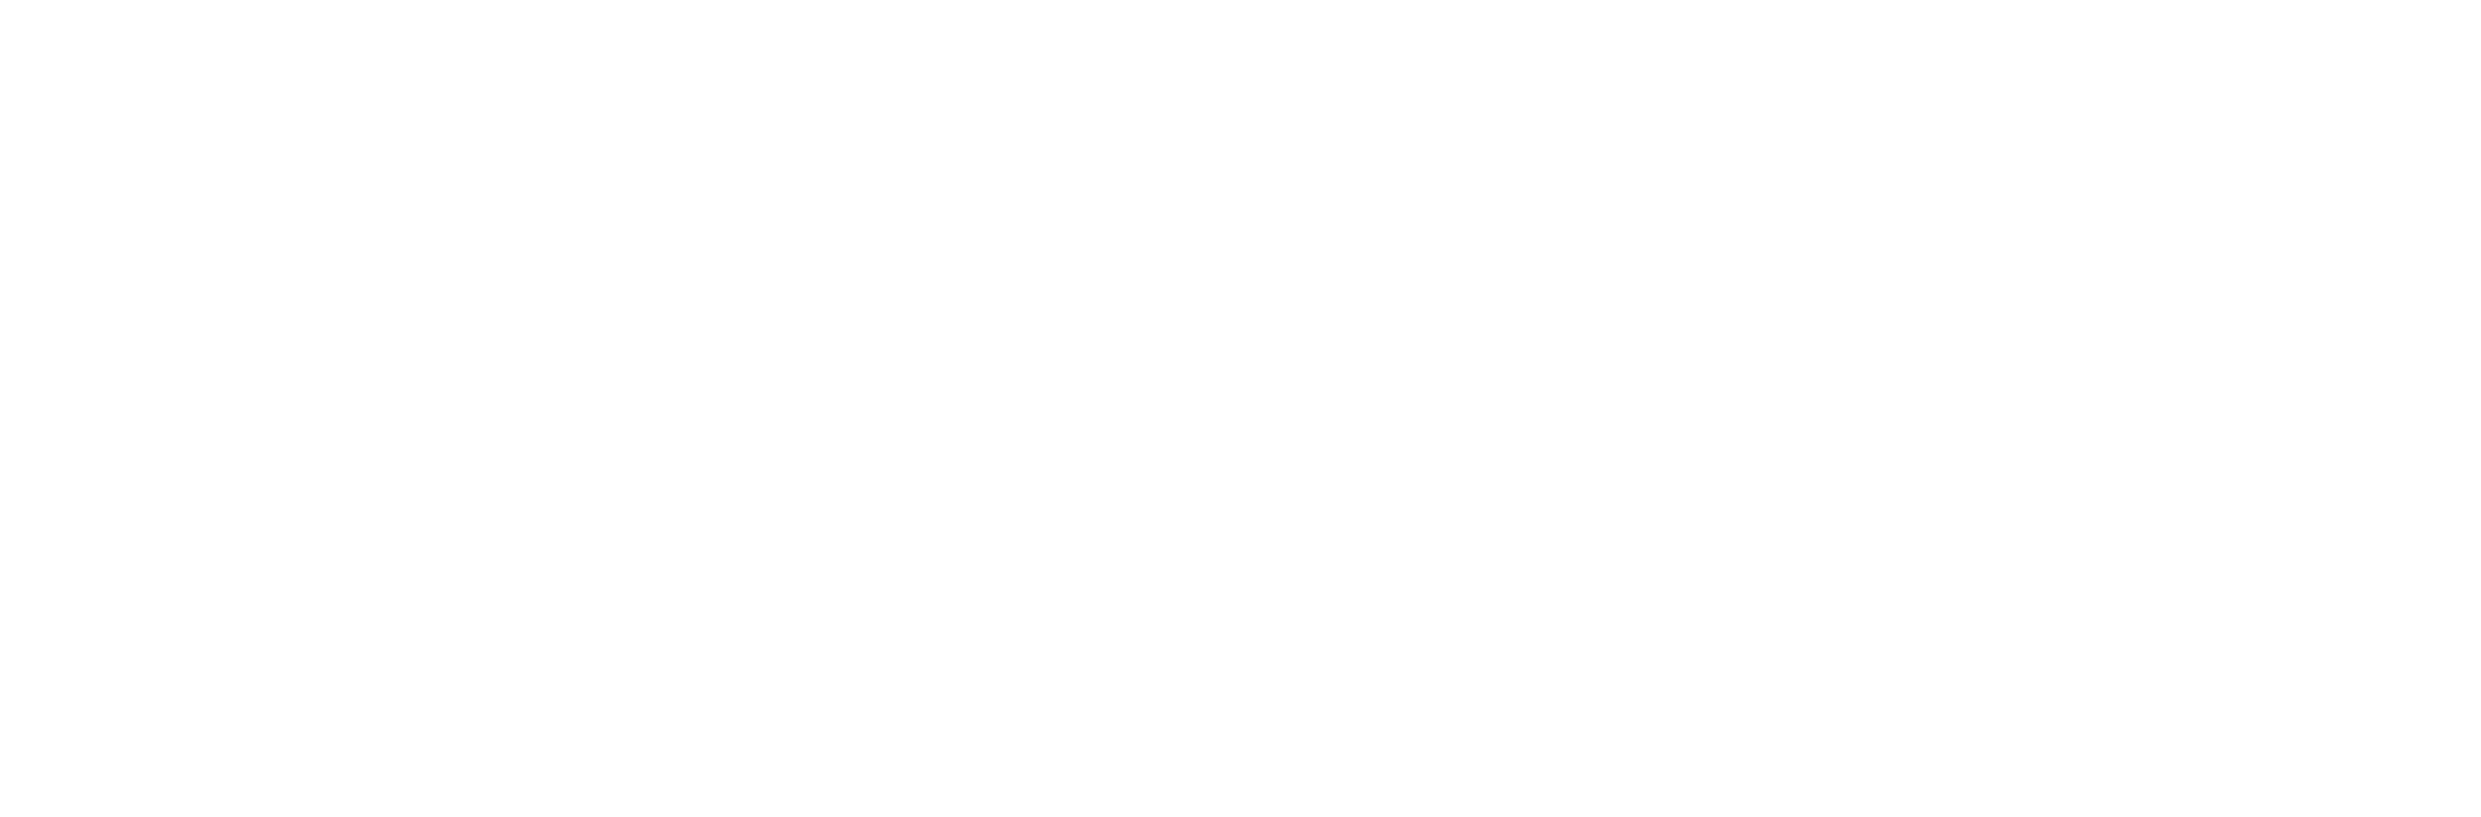 aurum-trasp-01.png